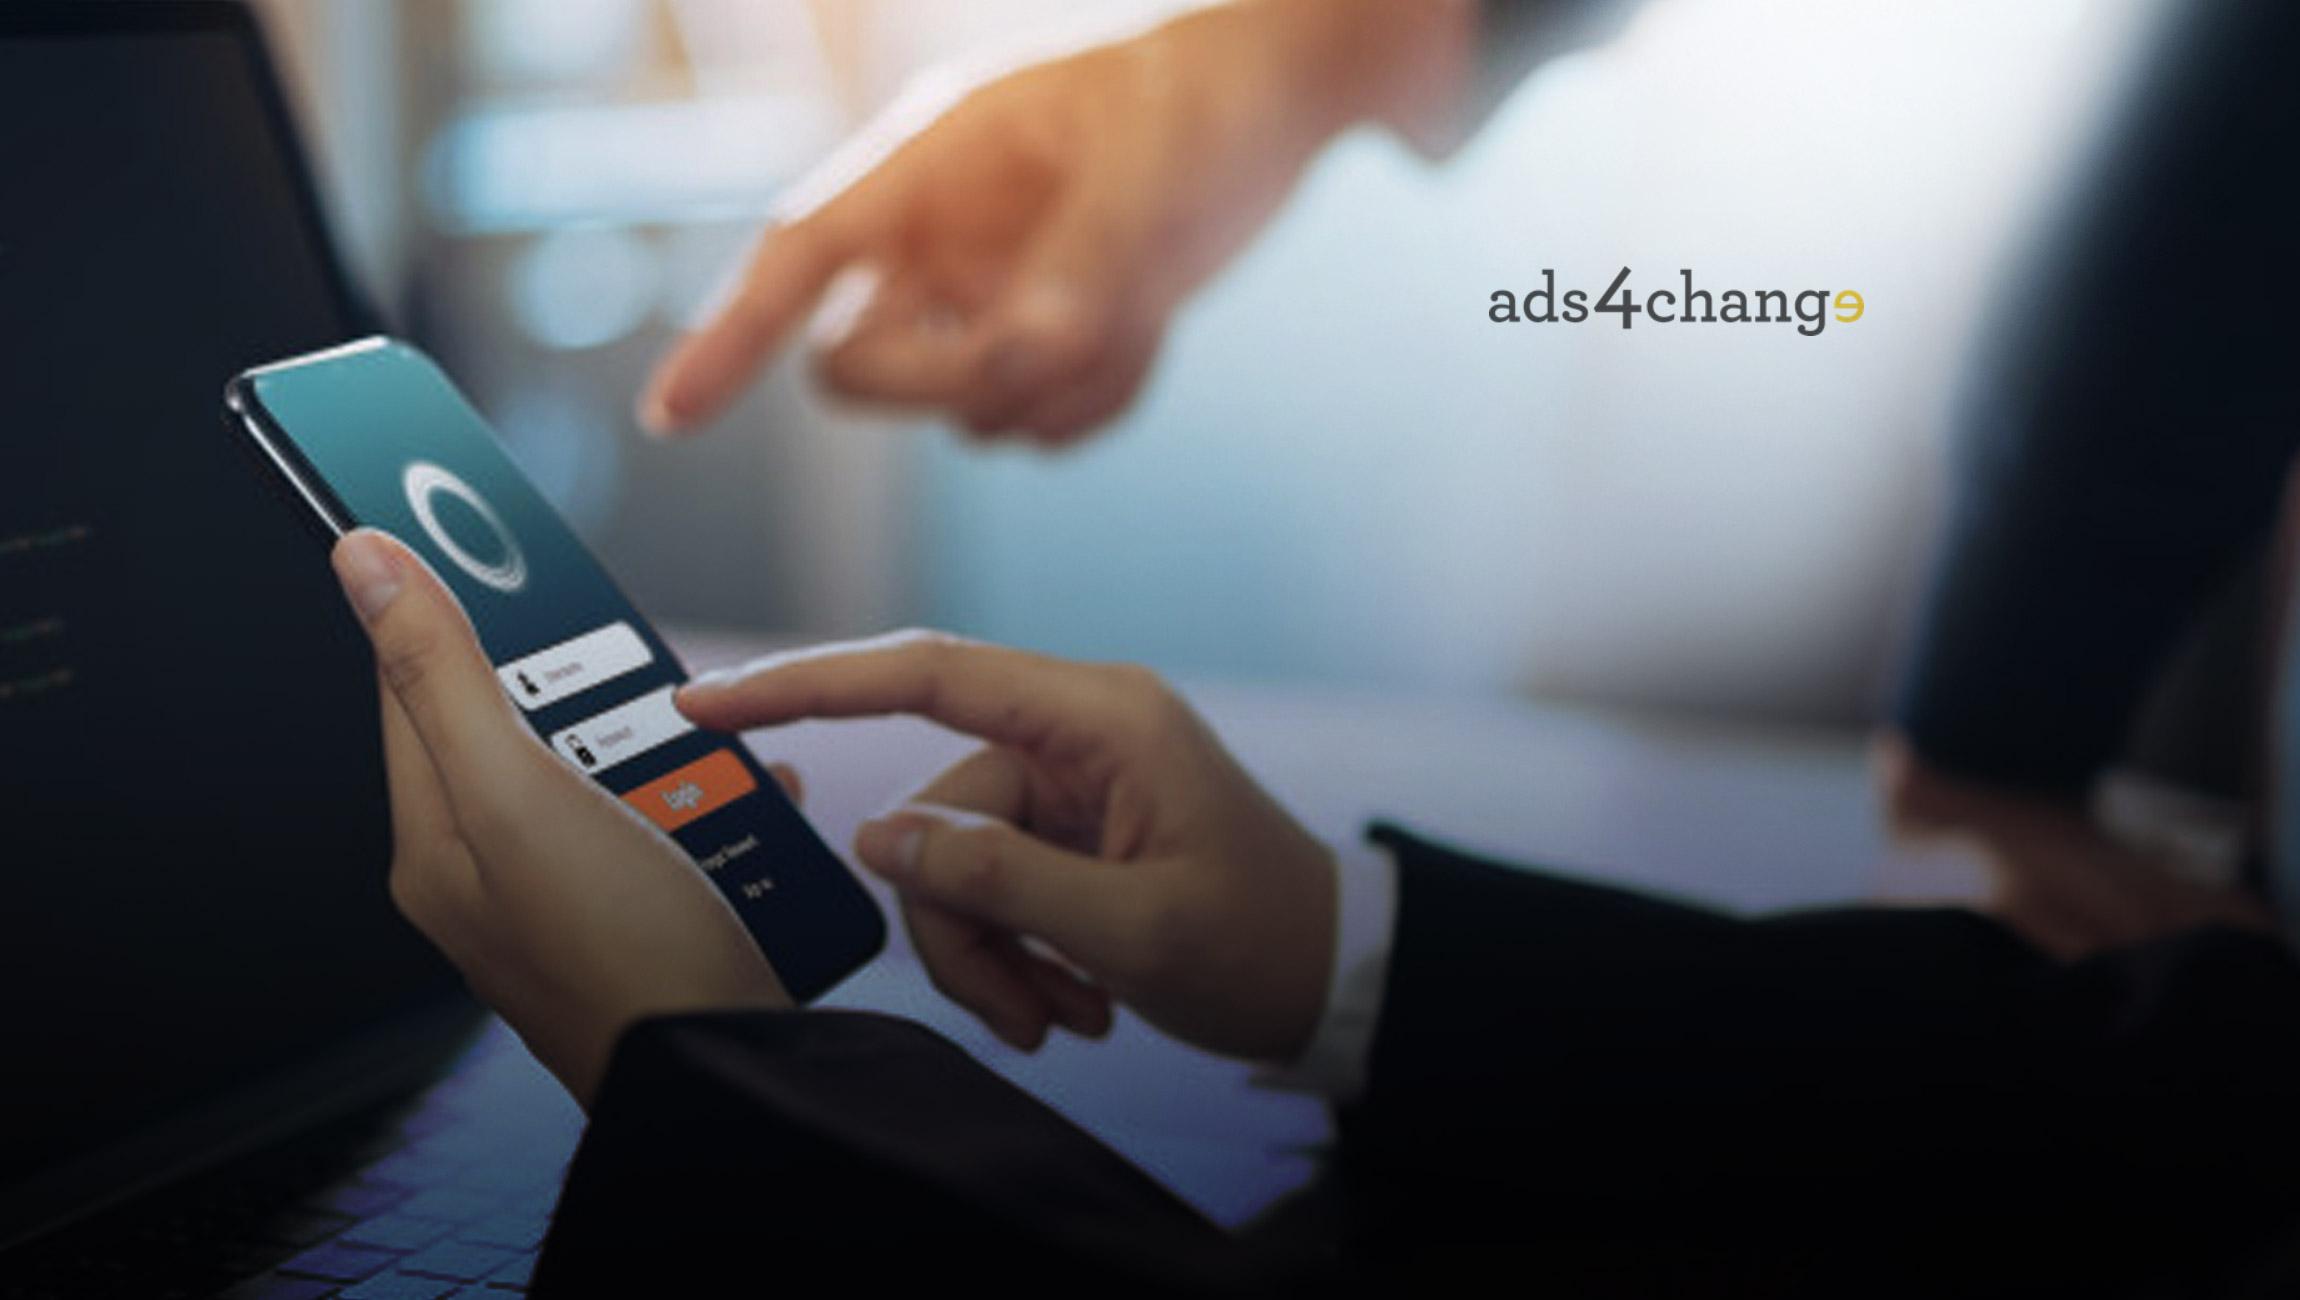 ads4change_-First-Digital-Advertising-Platform-for-Social-Enterprises-and-Non-Profits_-Announces-Official-Launch